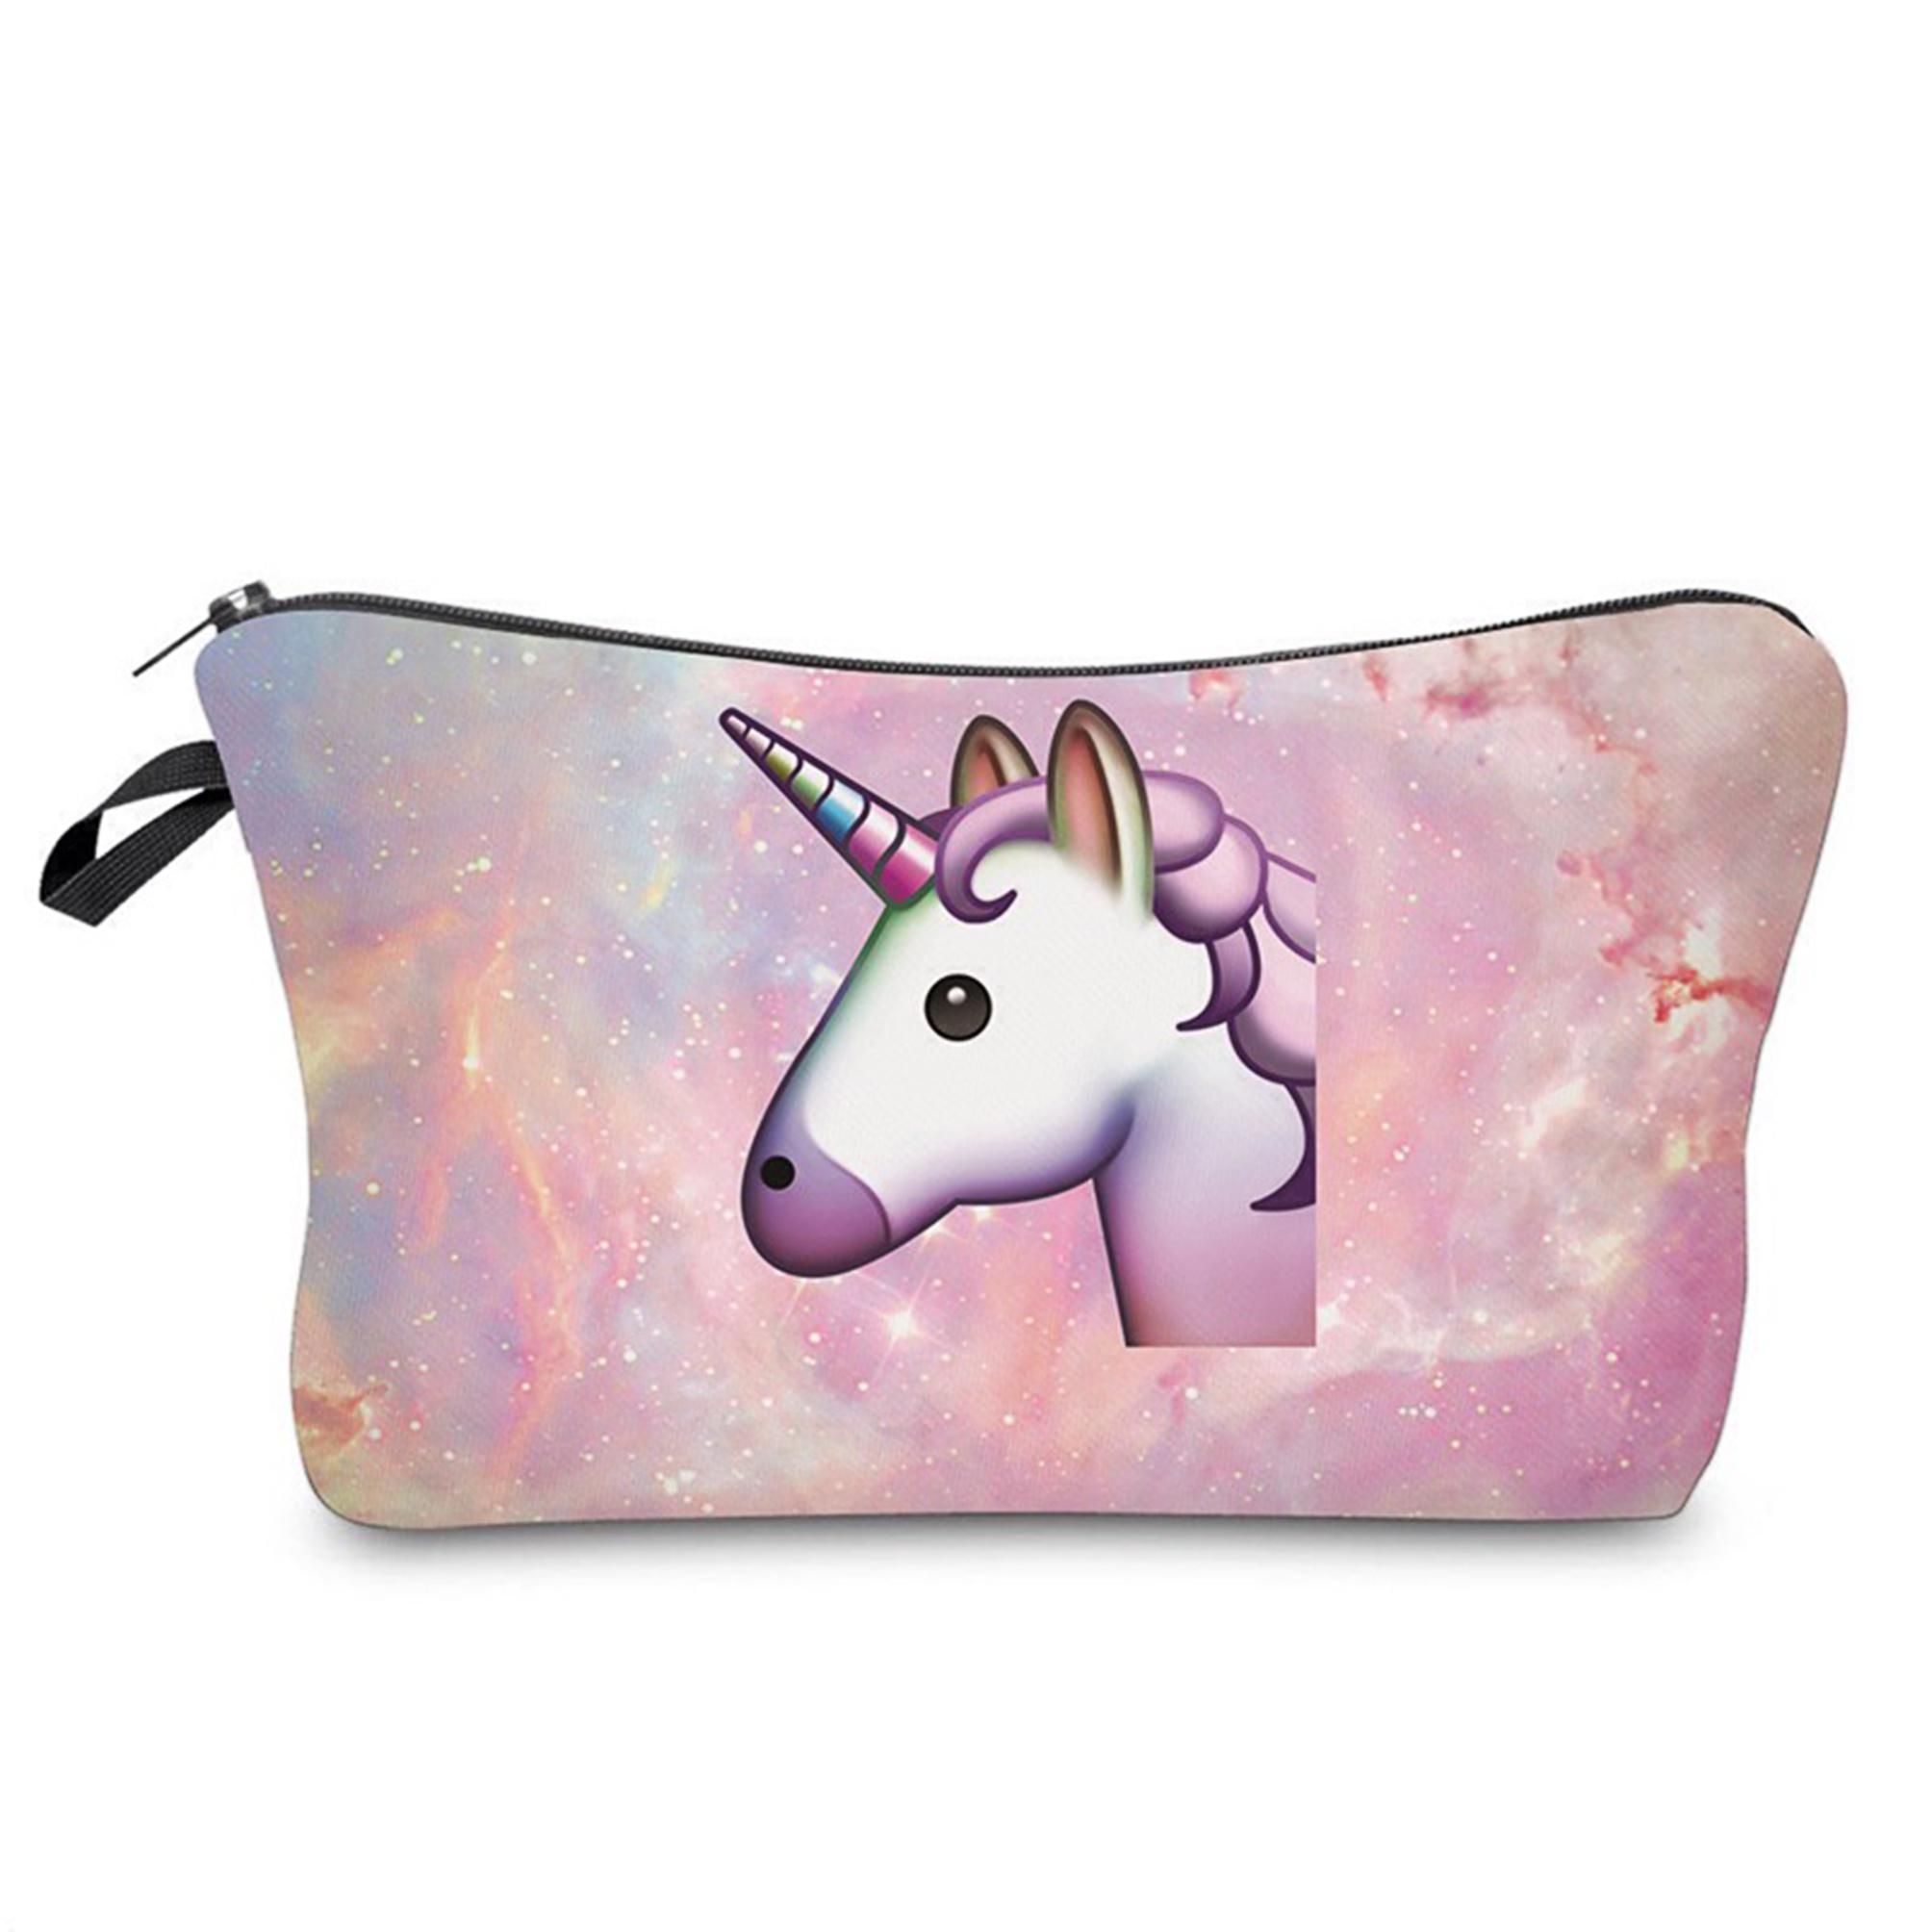 einhorn kosmetiktasche kulturbeutel unicorn beutel federmappe bulldogge make up ebay. Black Bedroom Furniture Sets. Home Design Ideas